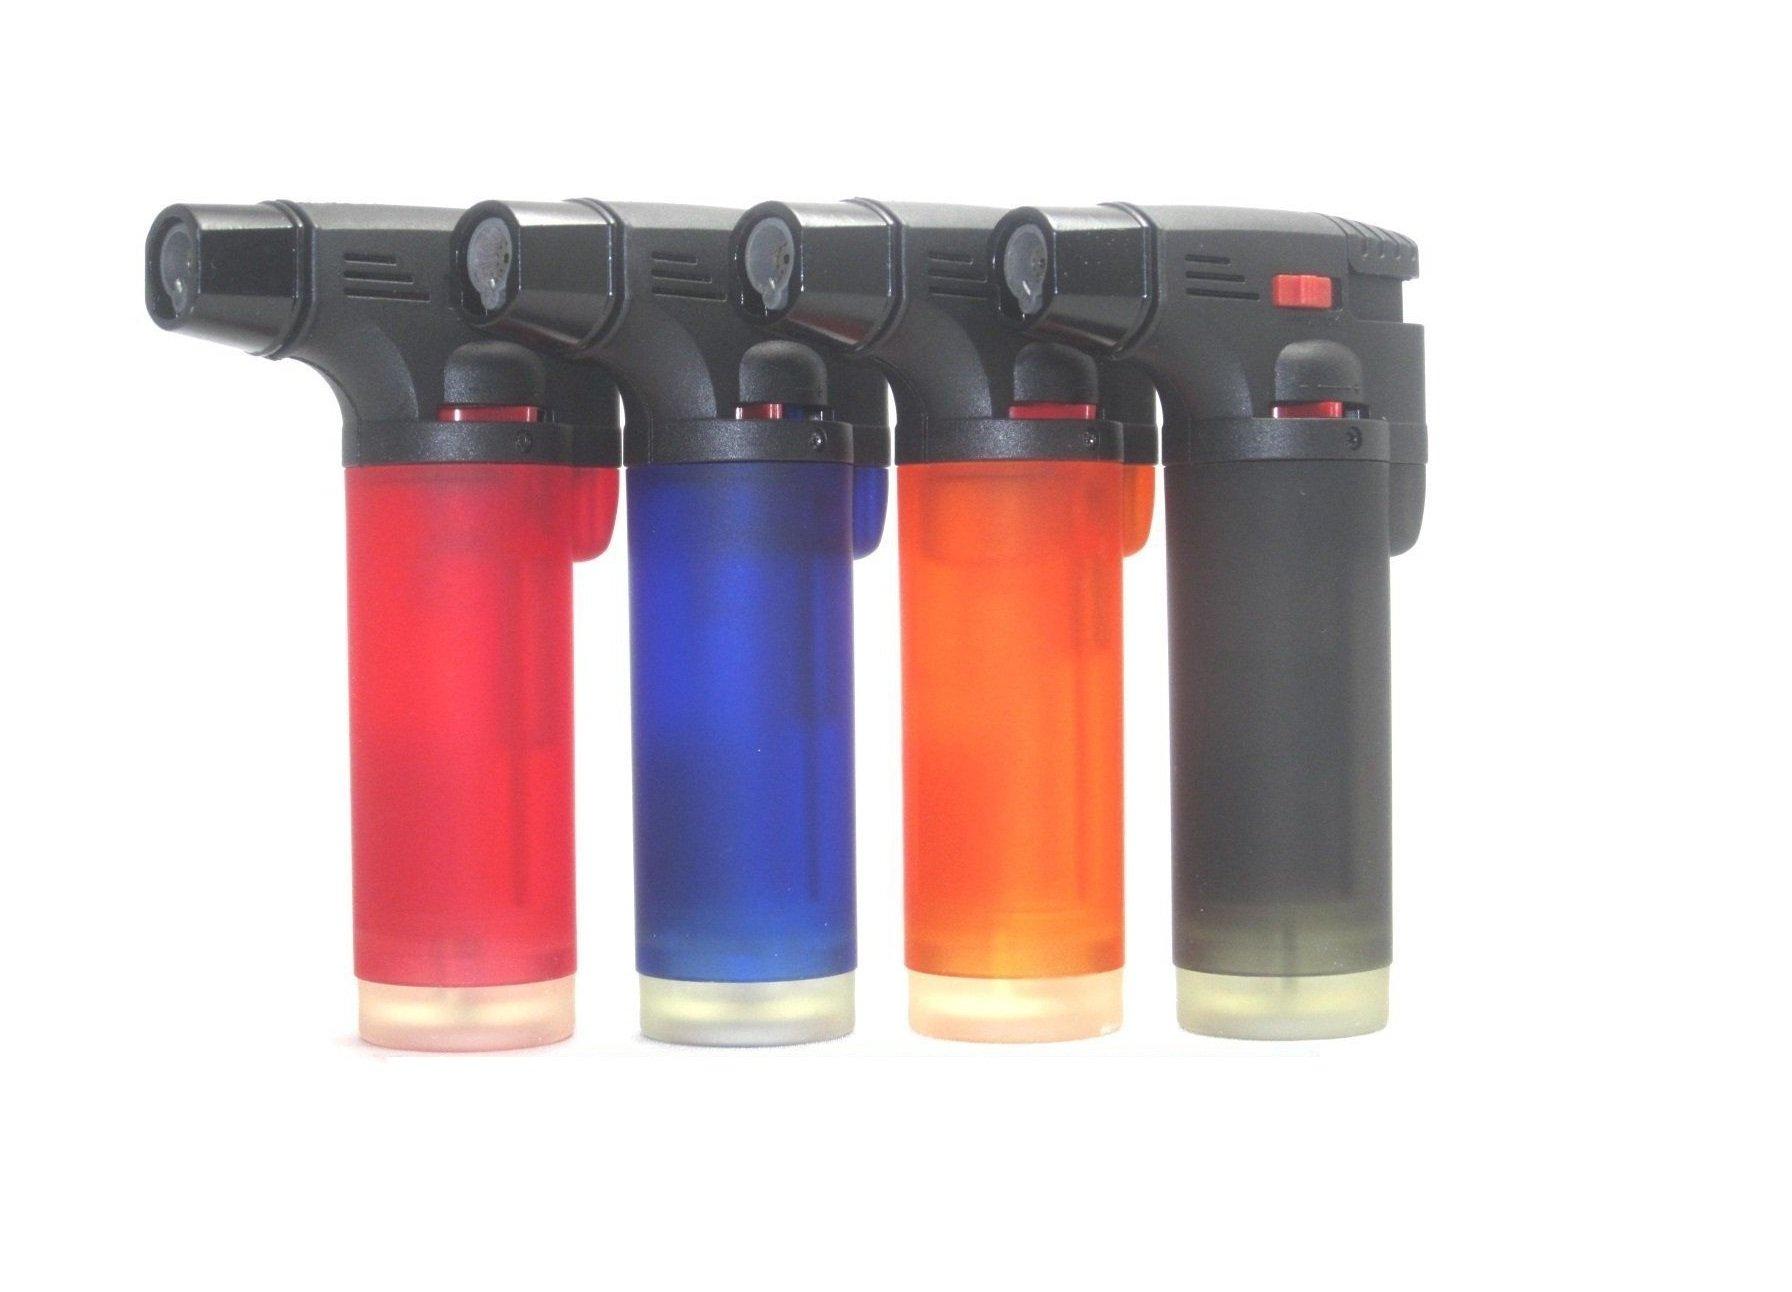 Eagle Jet Torch Gun Lighter Adjustable Flame Windproof Butane Refillable Pack of 4